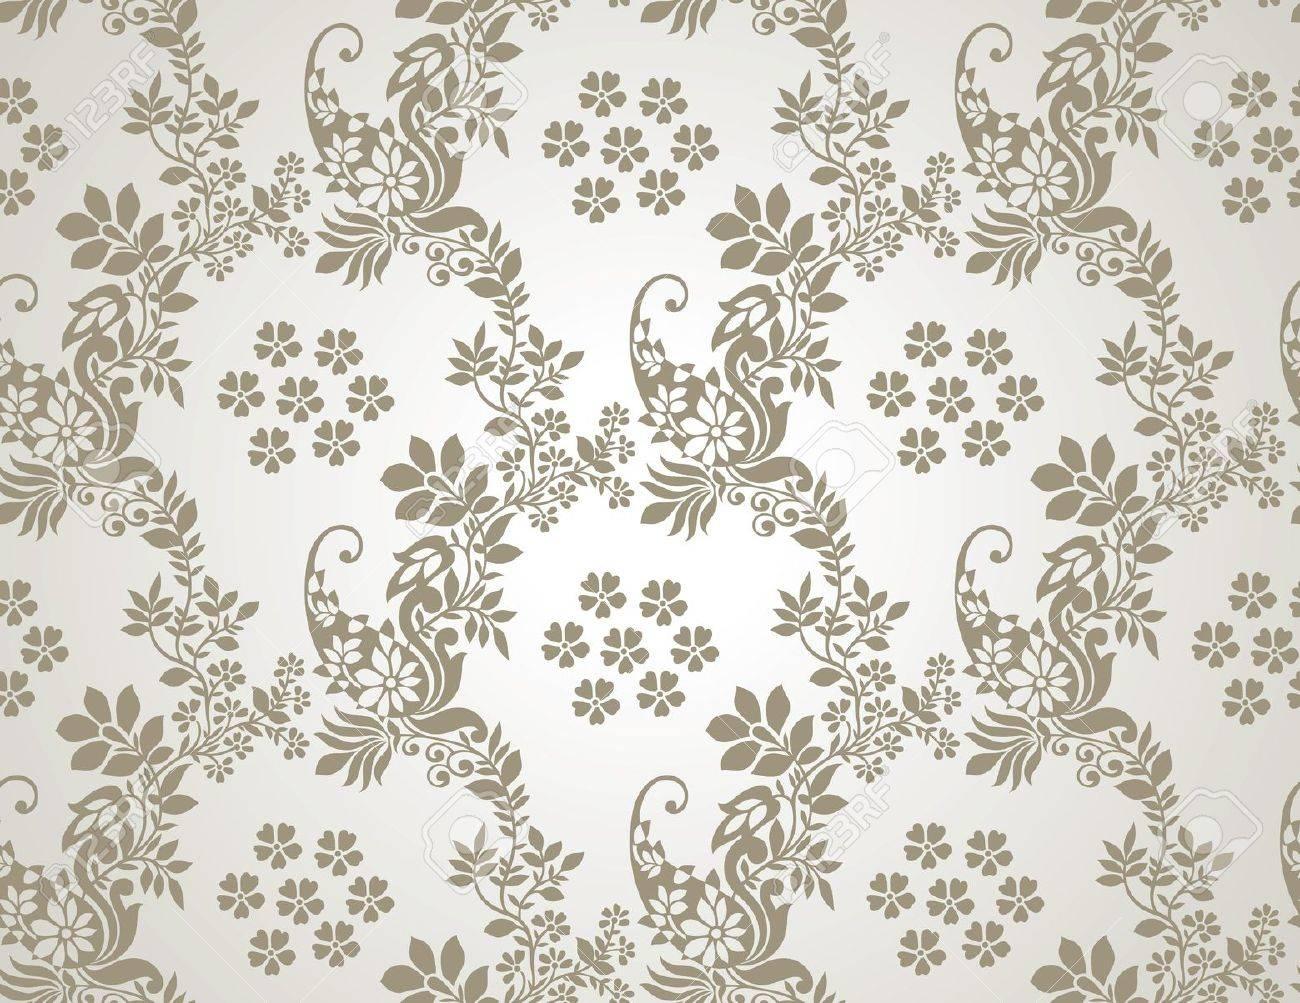 Floral Seamless Golden Wallpaper Stock Vector